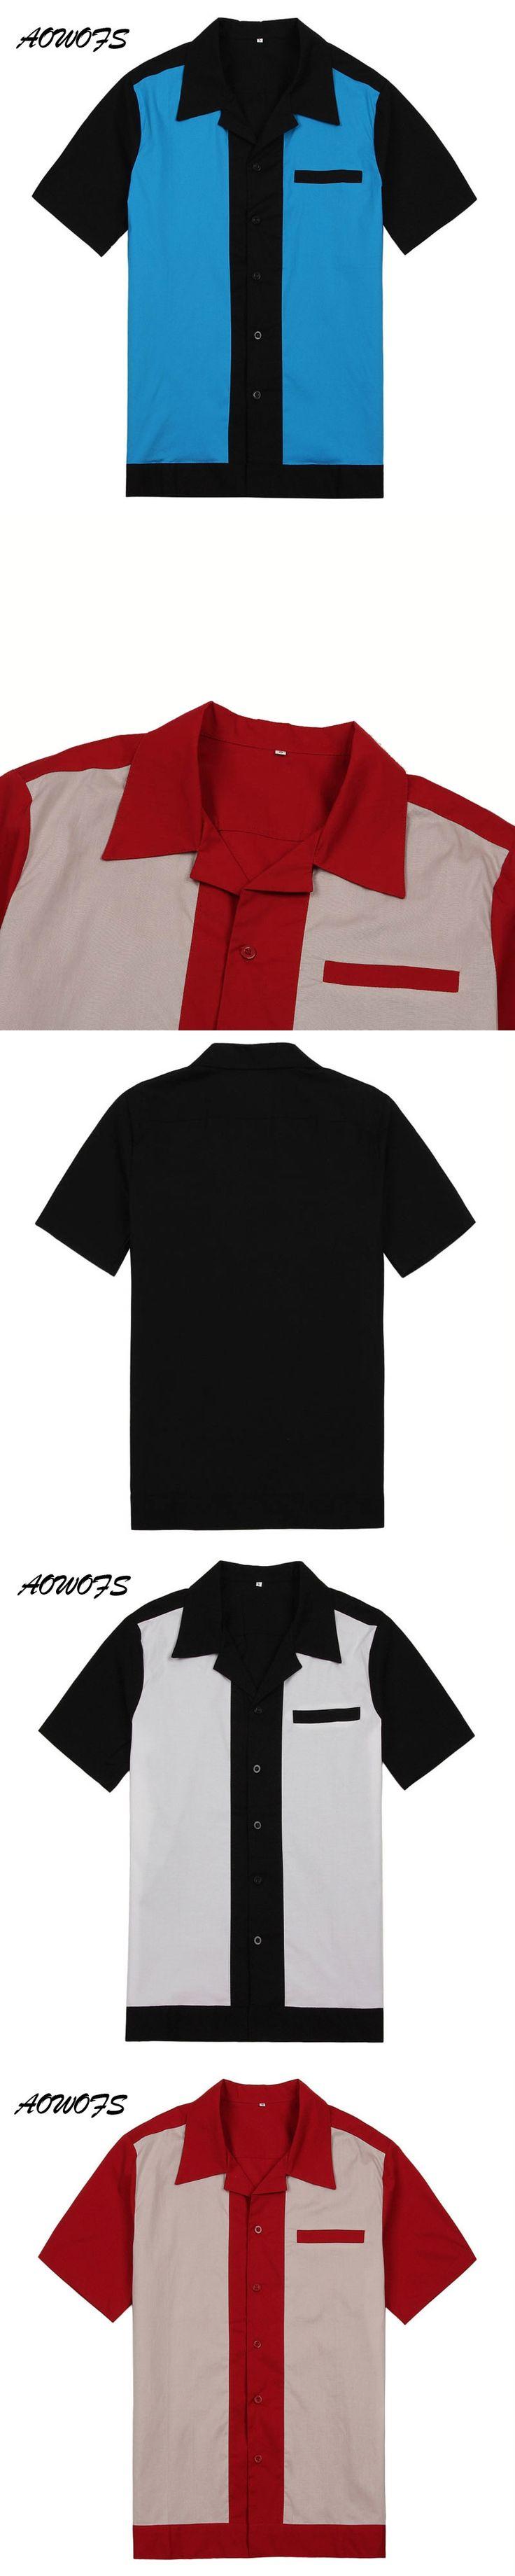 AOWOFS Rockabilly Men Western Cowboy Shirts Men Short Sleeve Black Shirts Vintage Button Rockabilly Shirts Men Cargo Uniforms